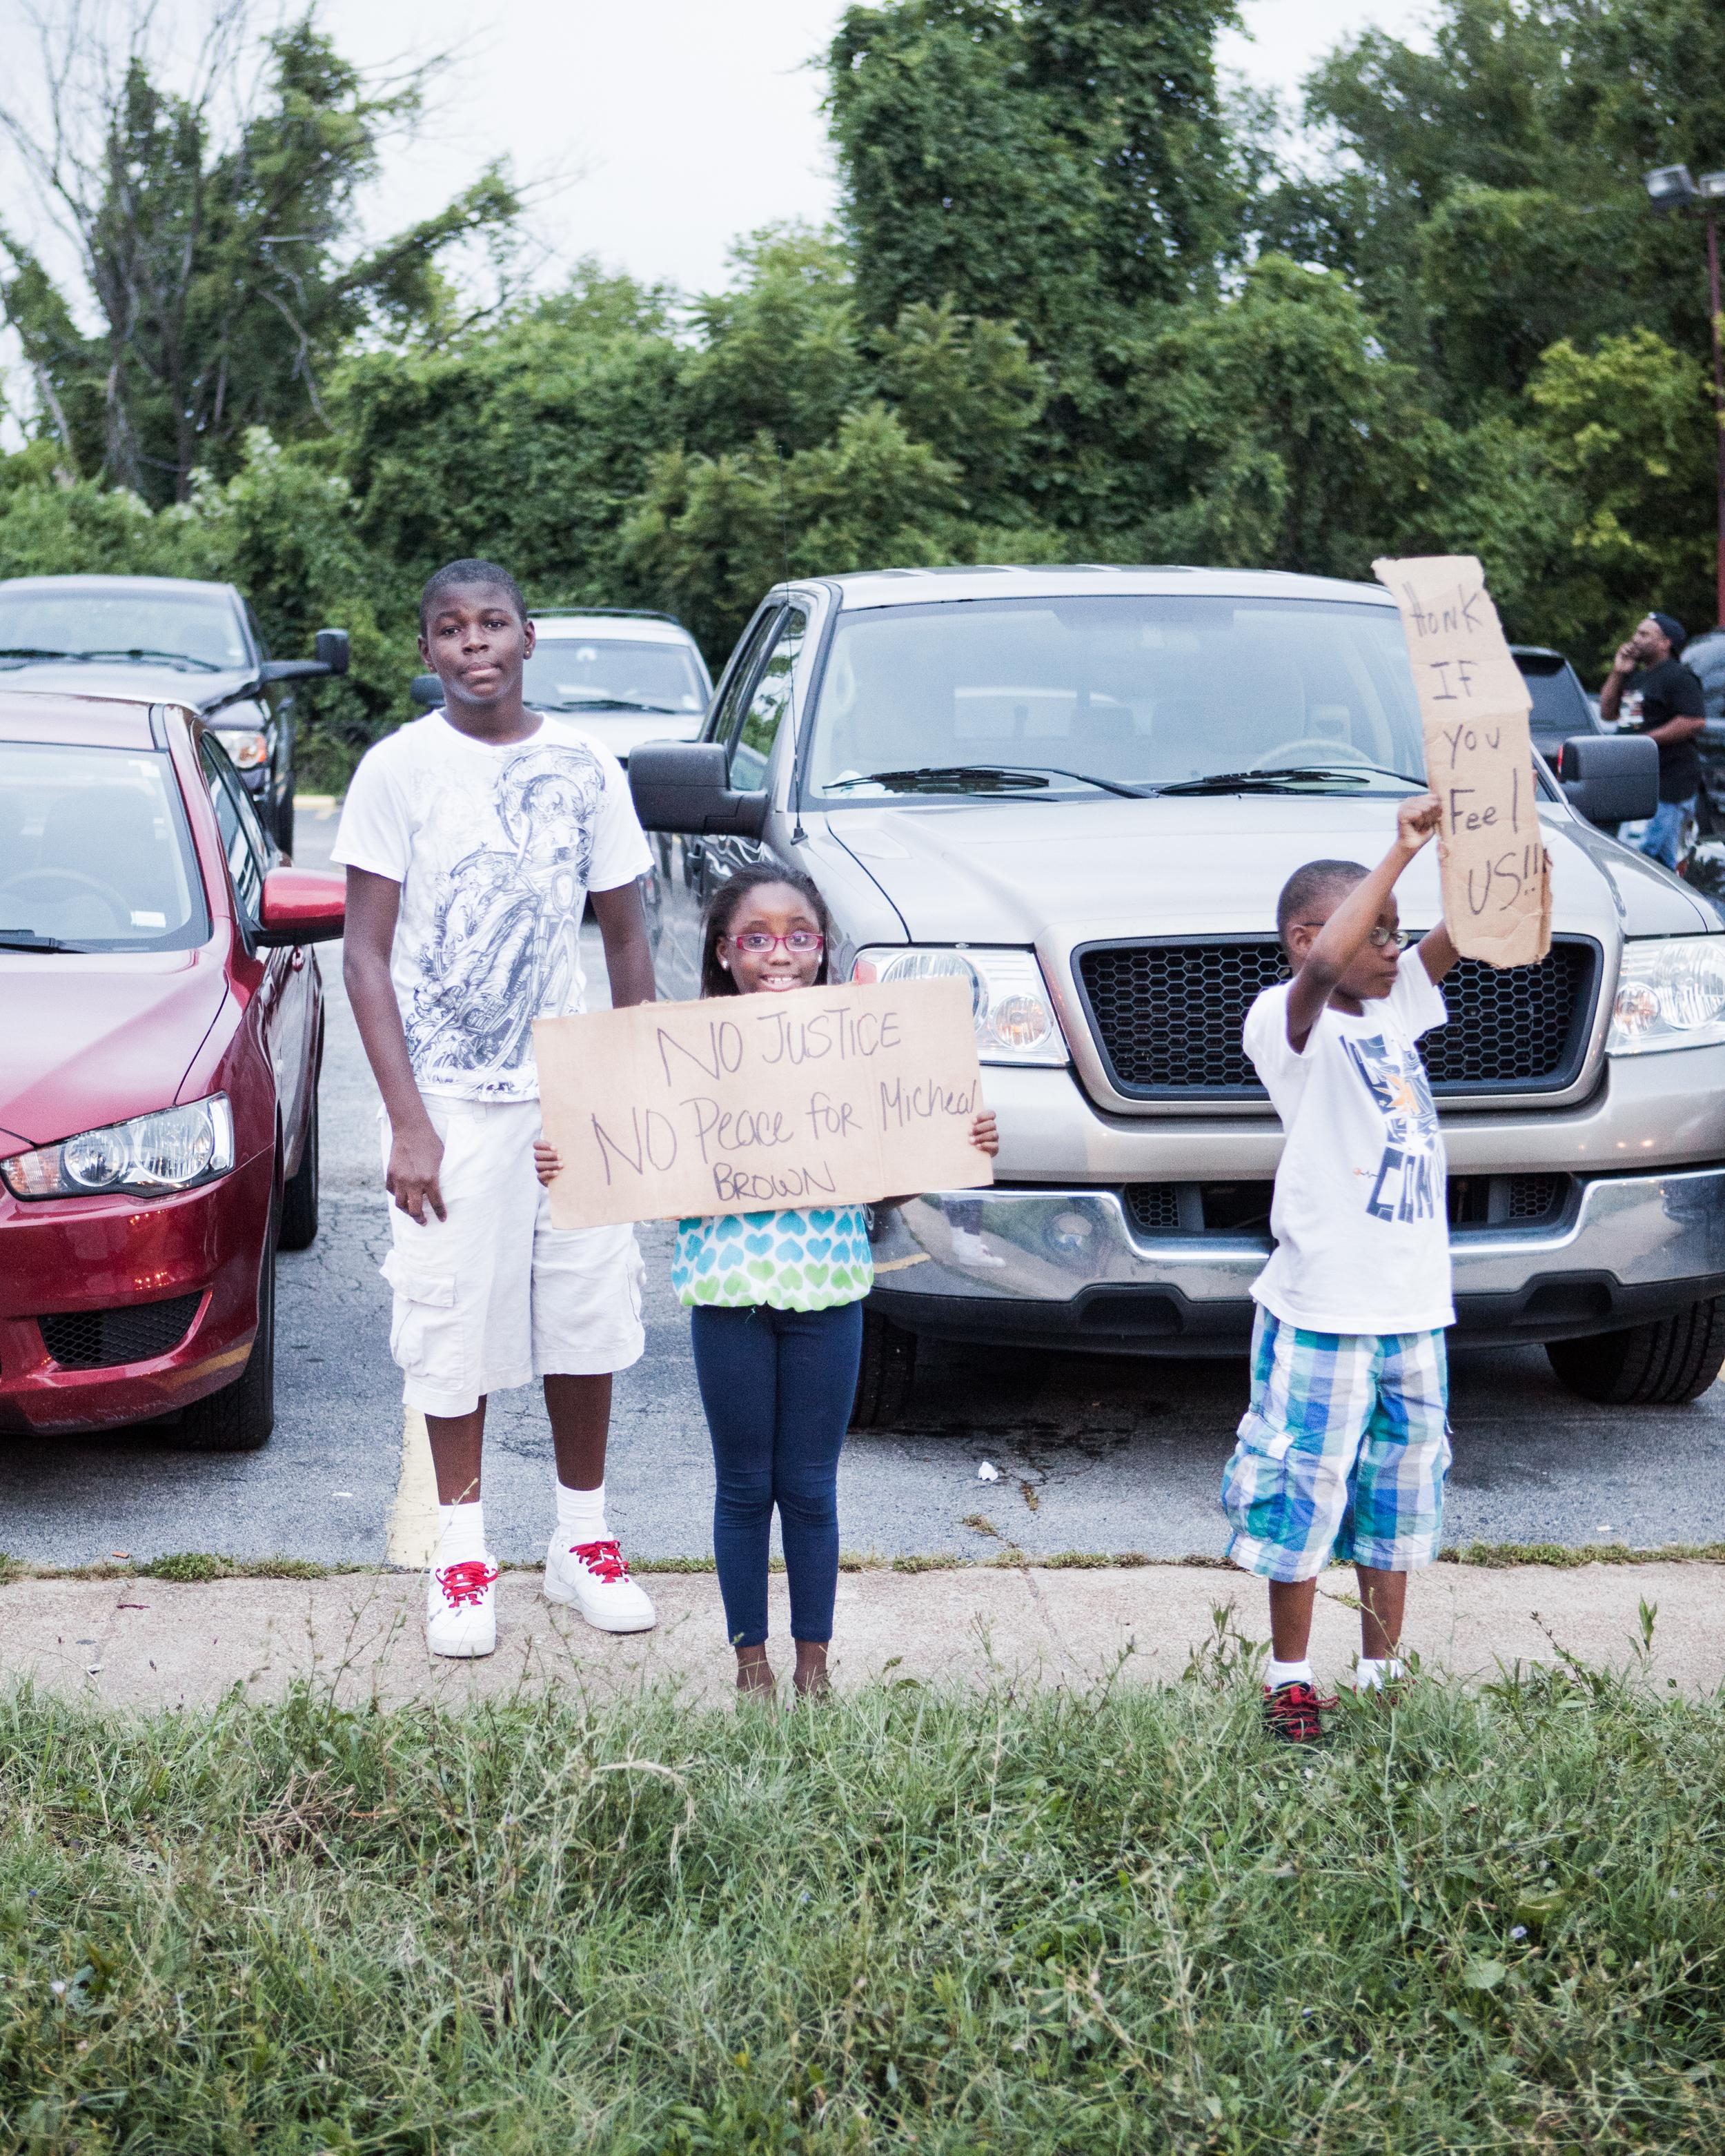 Ferguson, MO for The FADER